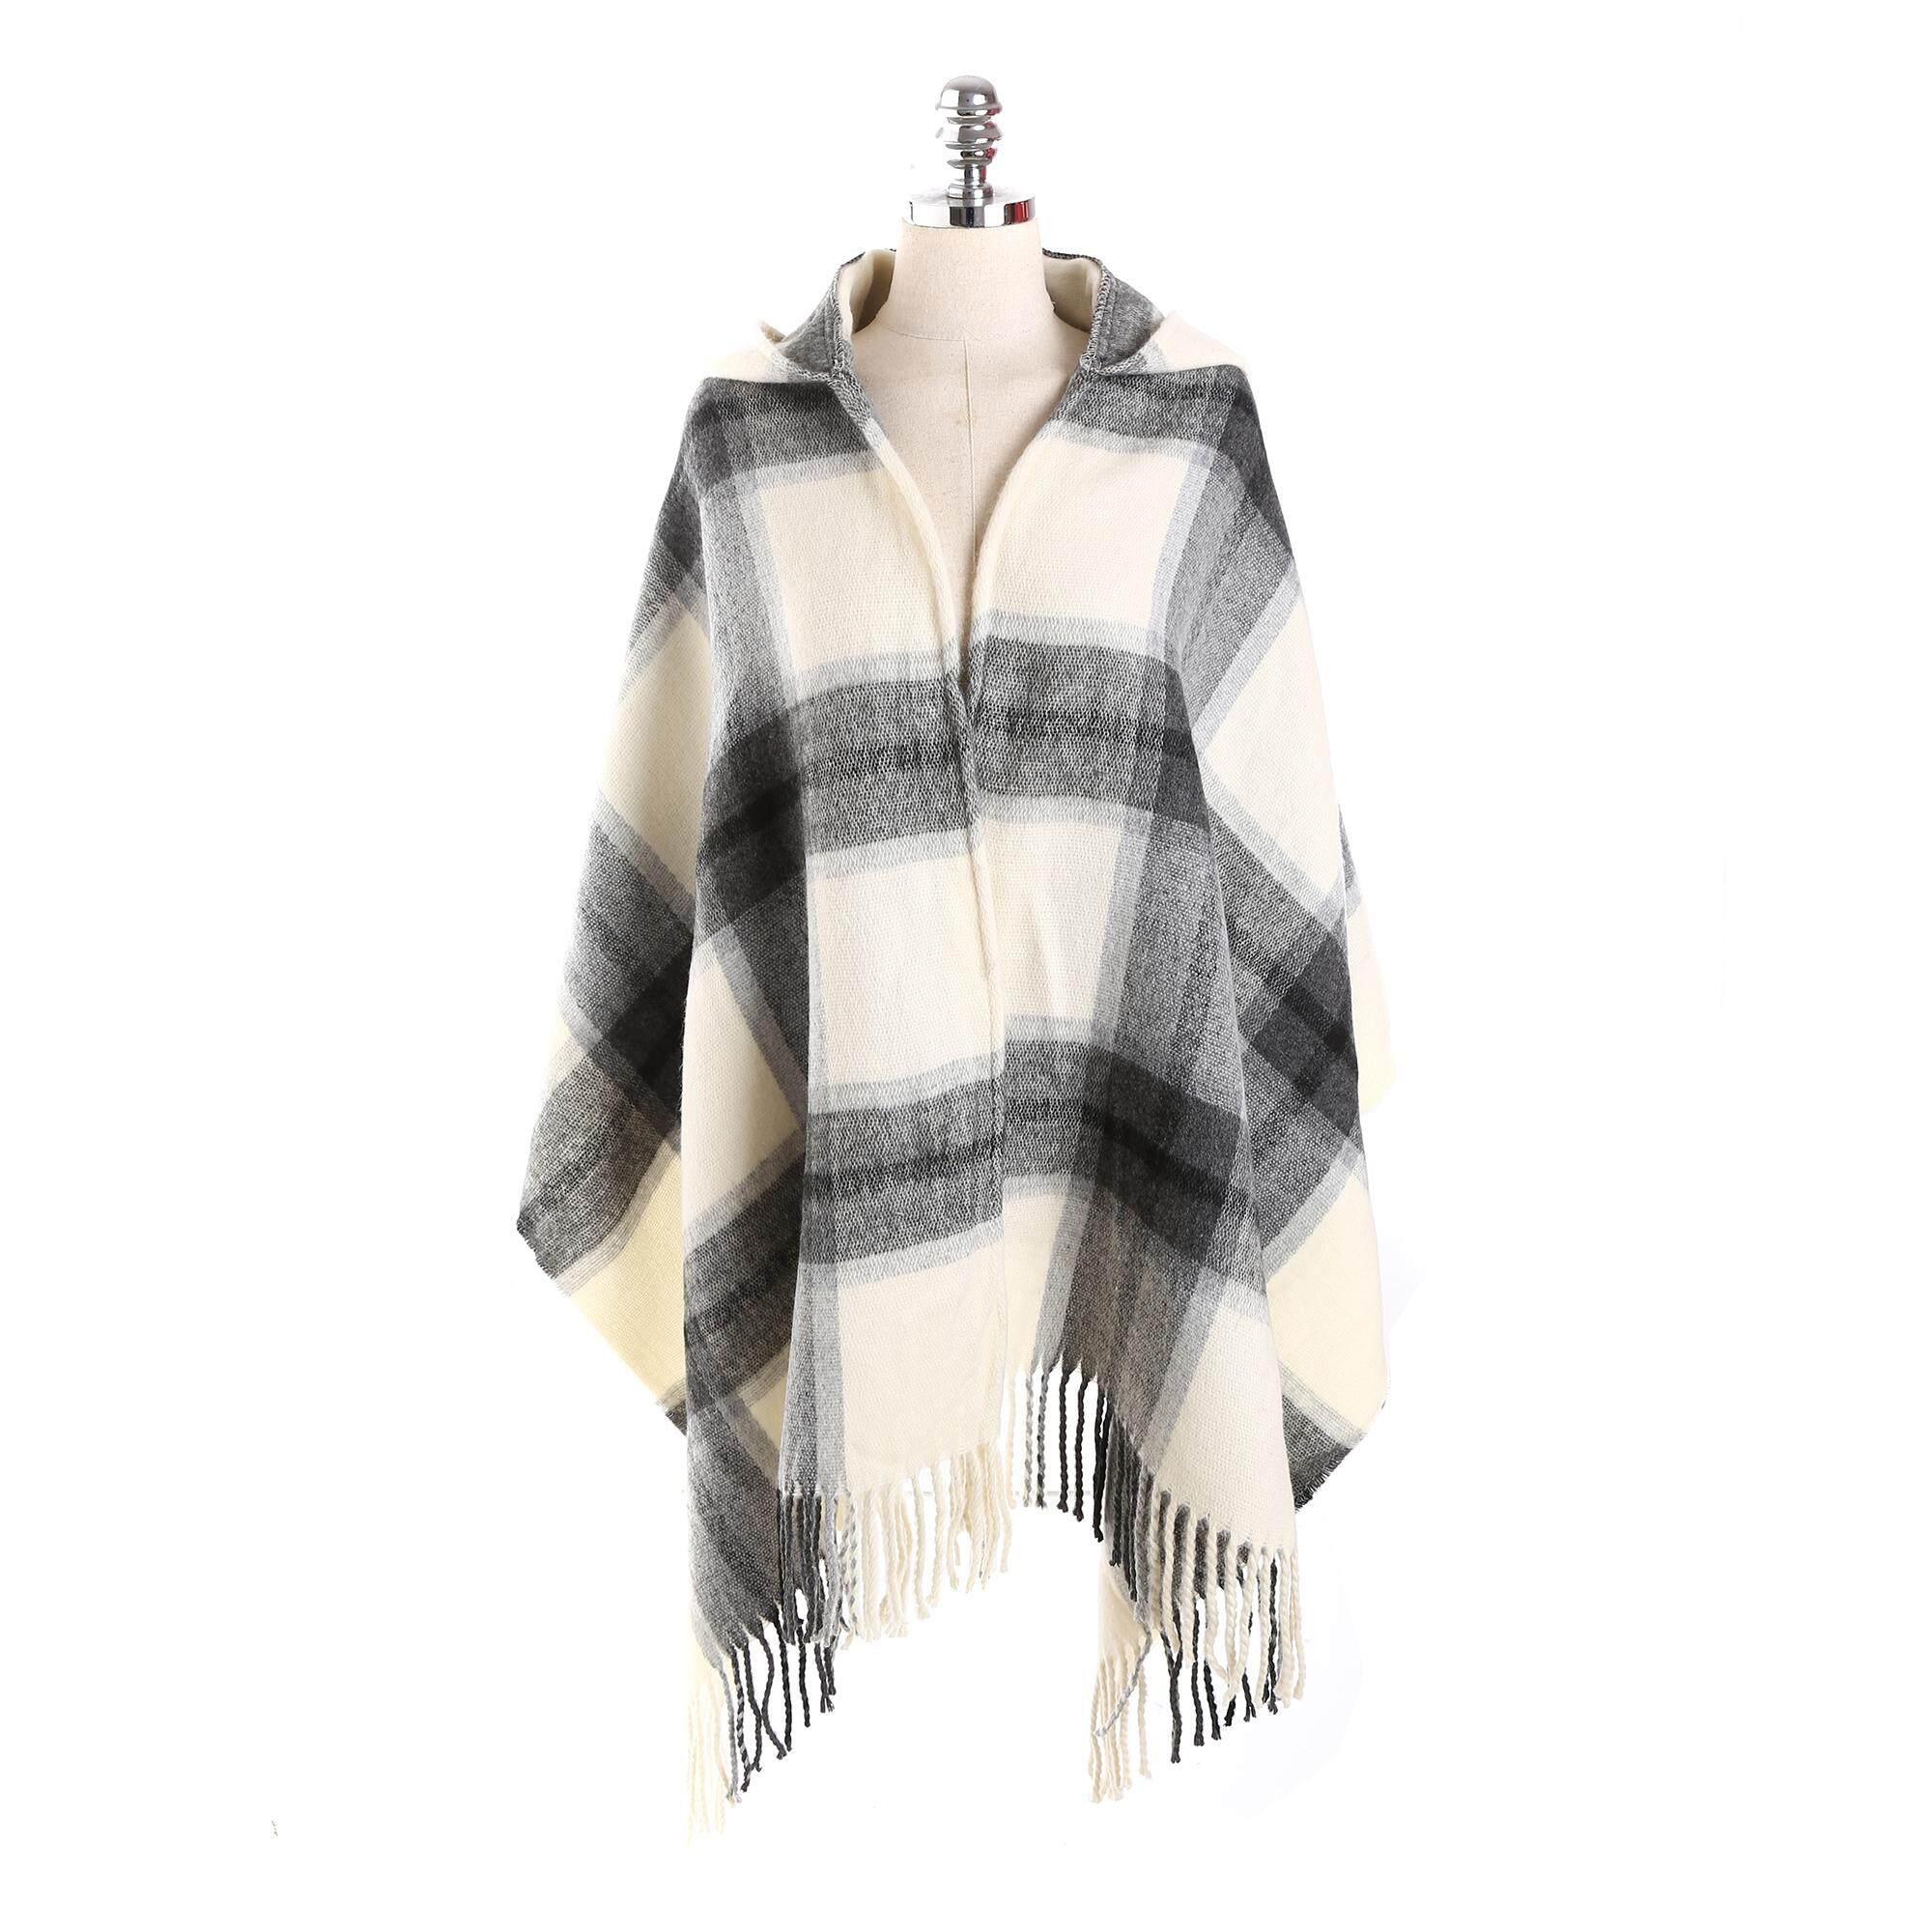 Women Winter Warm Tartan Cashmere Scarf New Designer Plaid Hood Hat Scarf Shawls Scarves Wraps By Moonbeam.